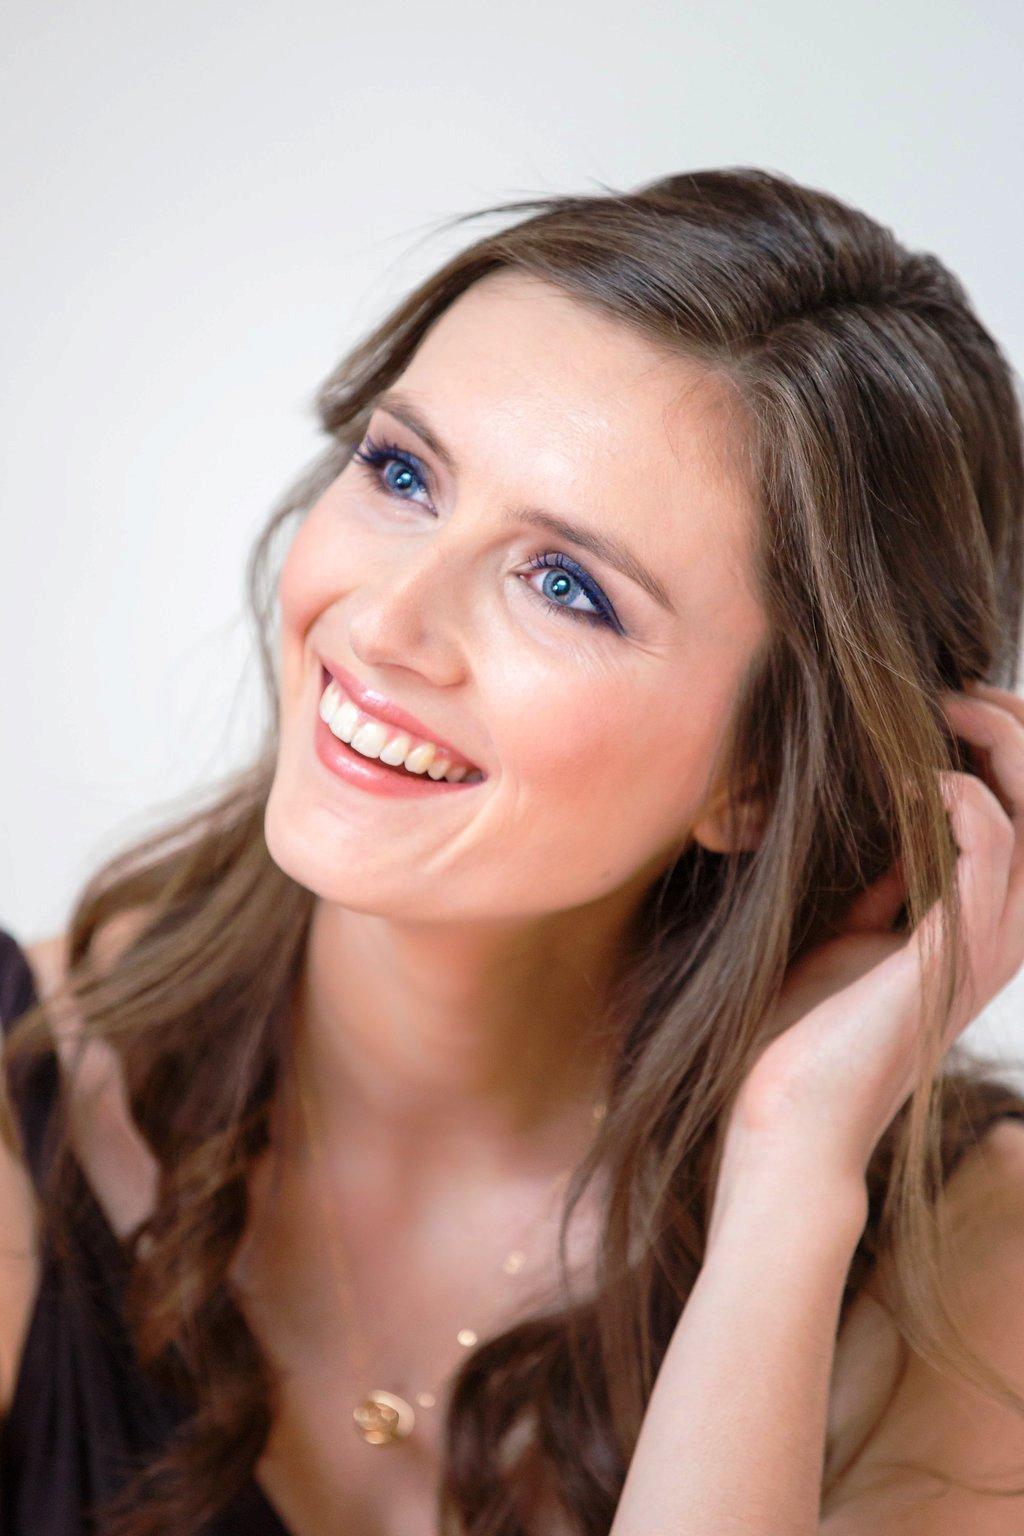 7-Eyeliner Makeup Ideas